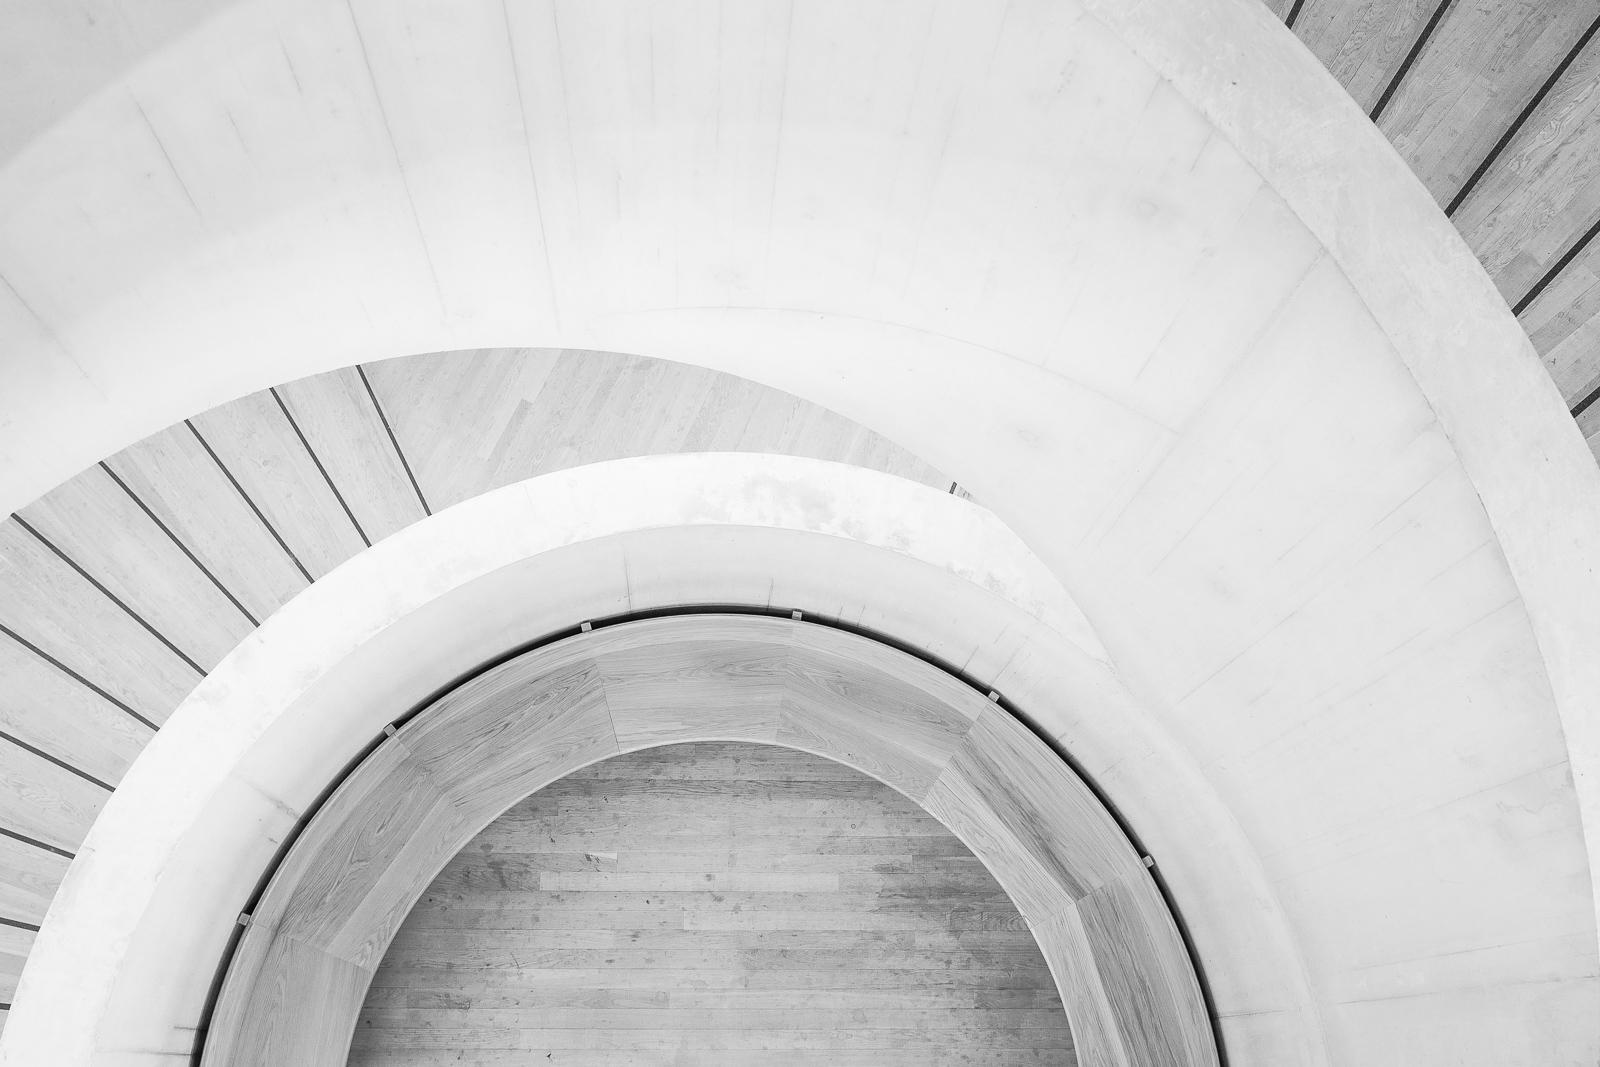 Tate Modern/ Switch House, London | Architect  Herzog and de Meuron